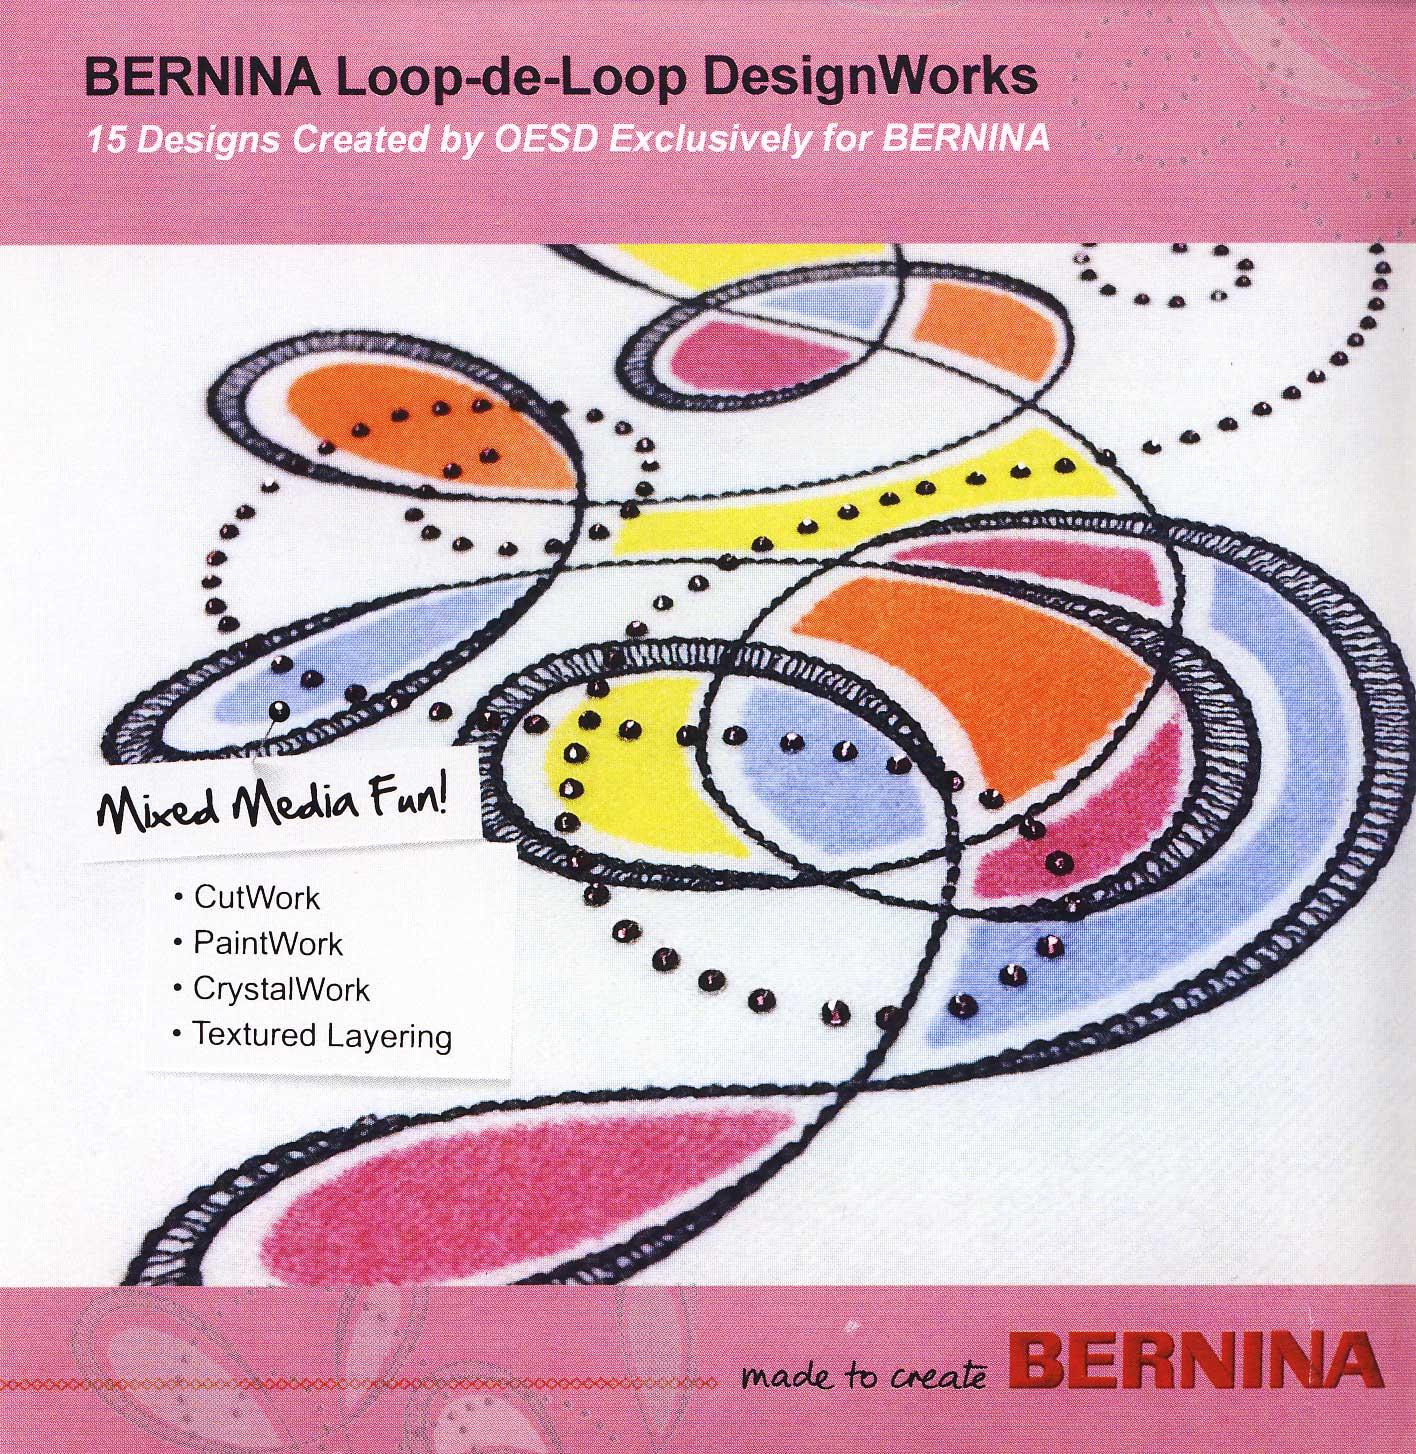 BERNINA DesignWorks CD Loop-de-Loop